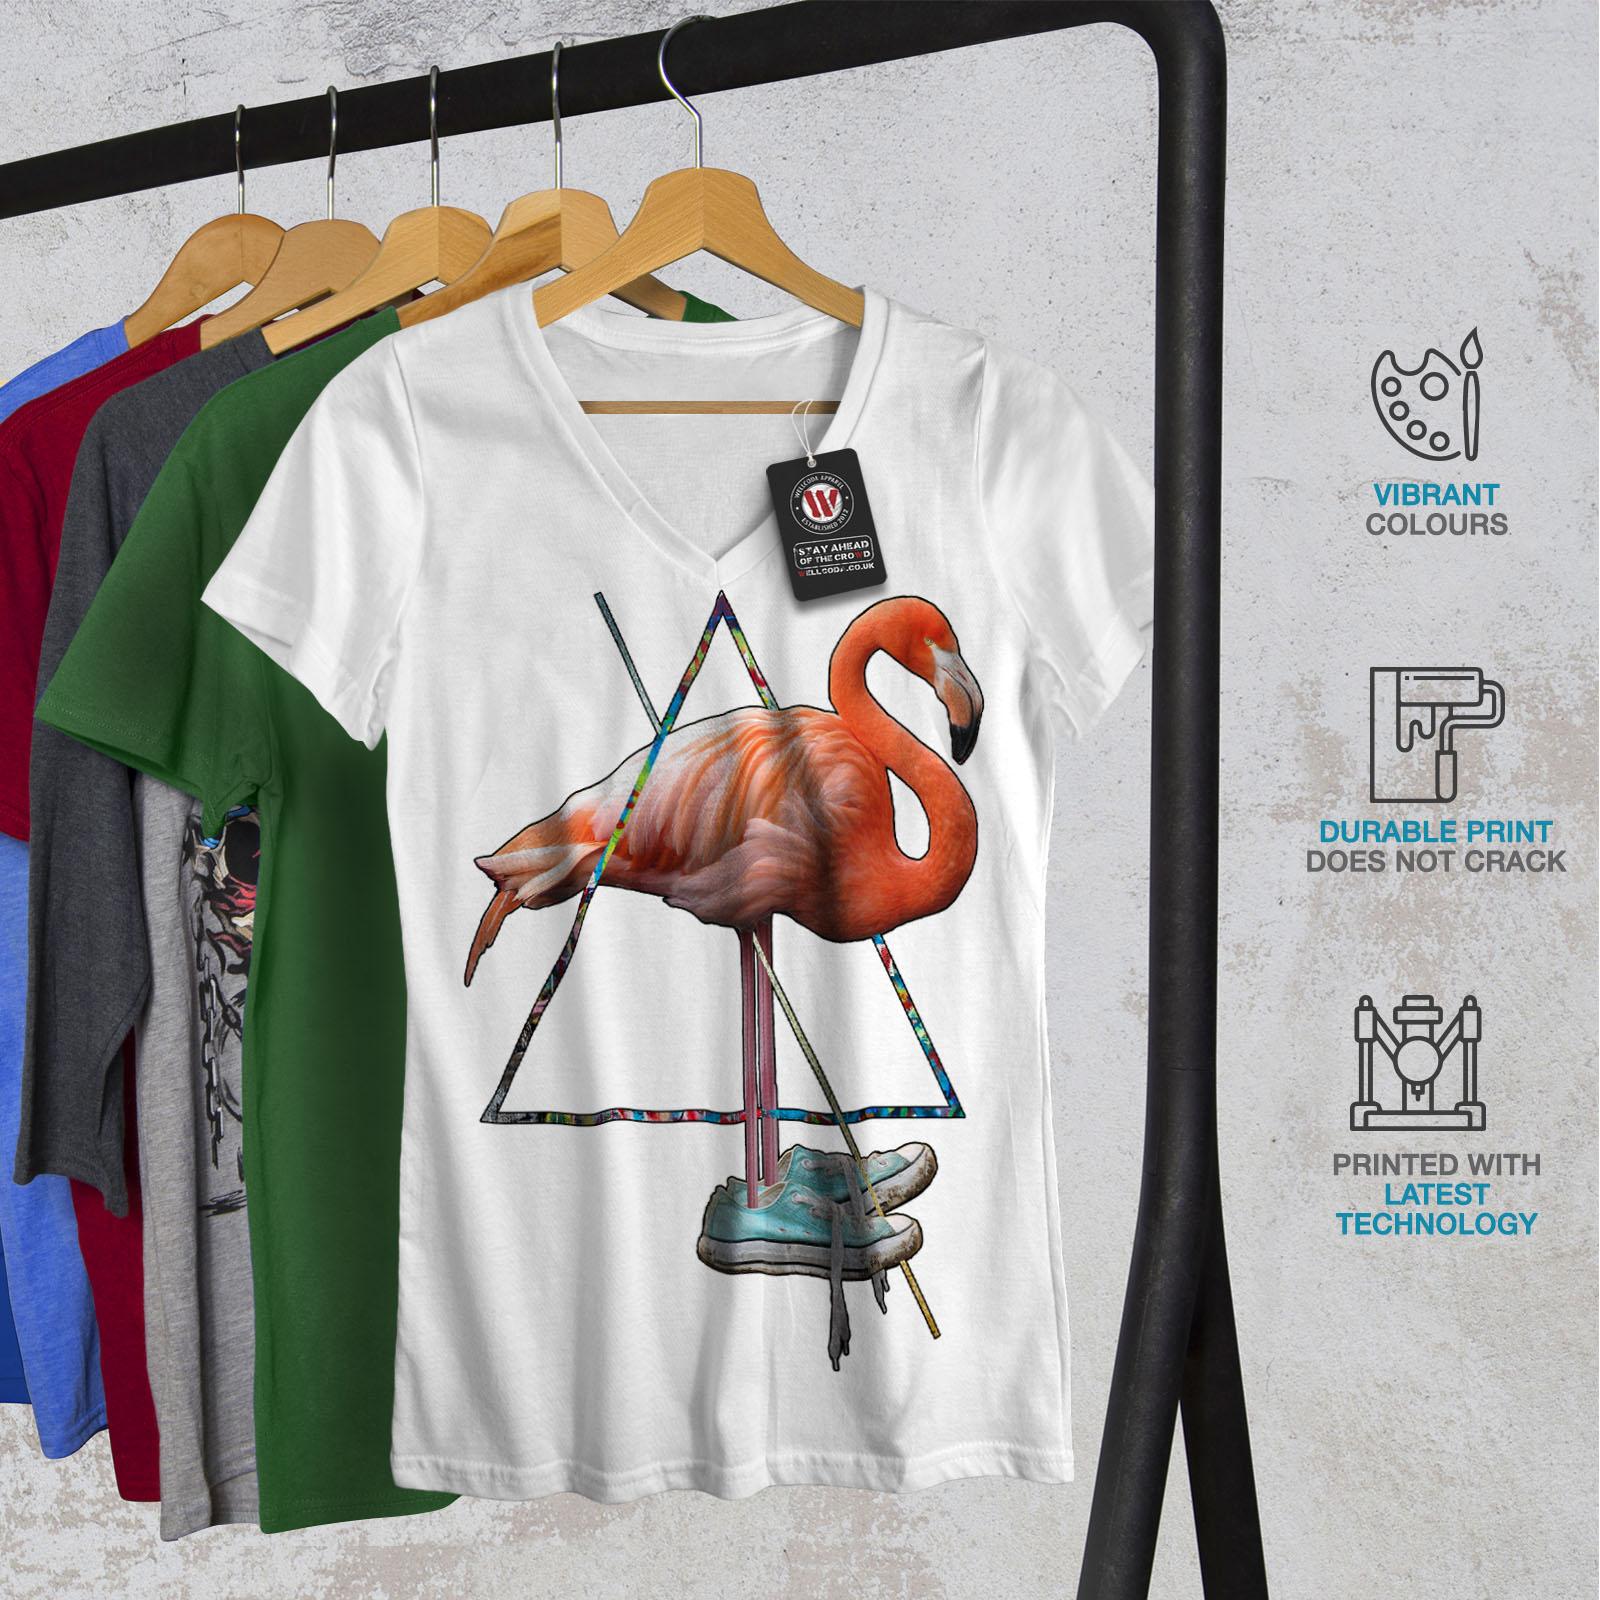 Wellcoda-Flamingo-Bird-Shoe-Womens-V-Neck-T-shirt-Sneaker-Graphic-Design-Tee thumbnail 8